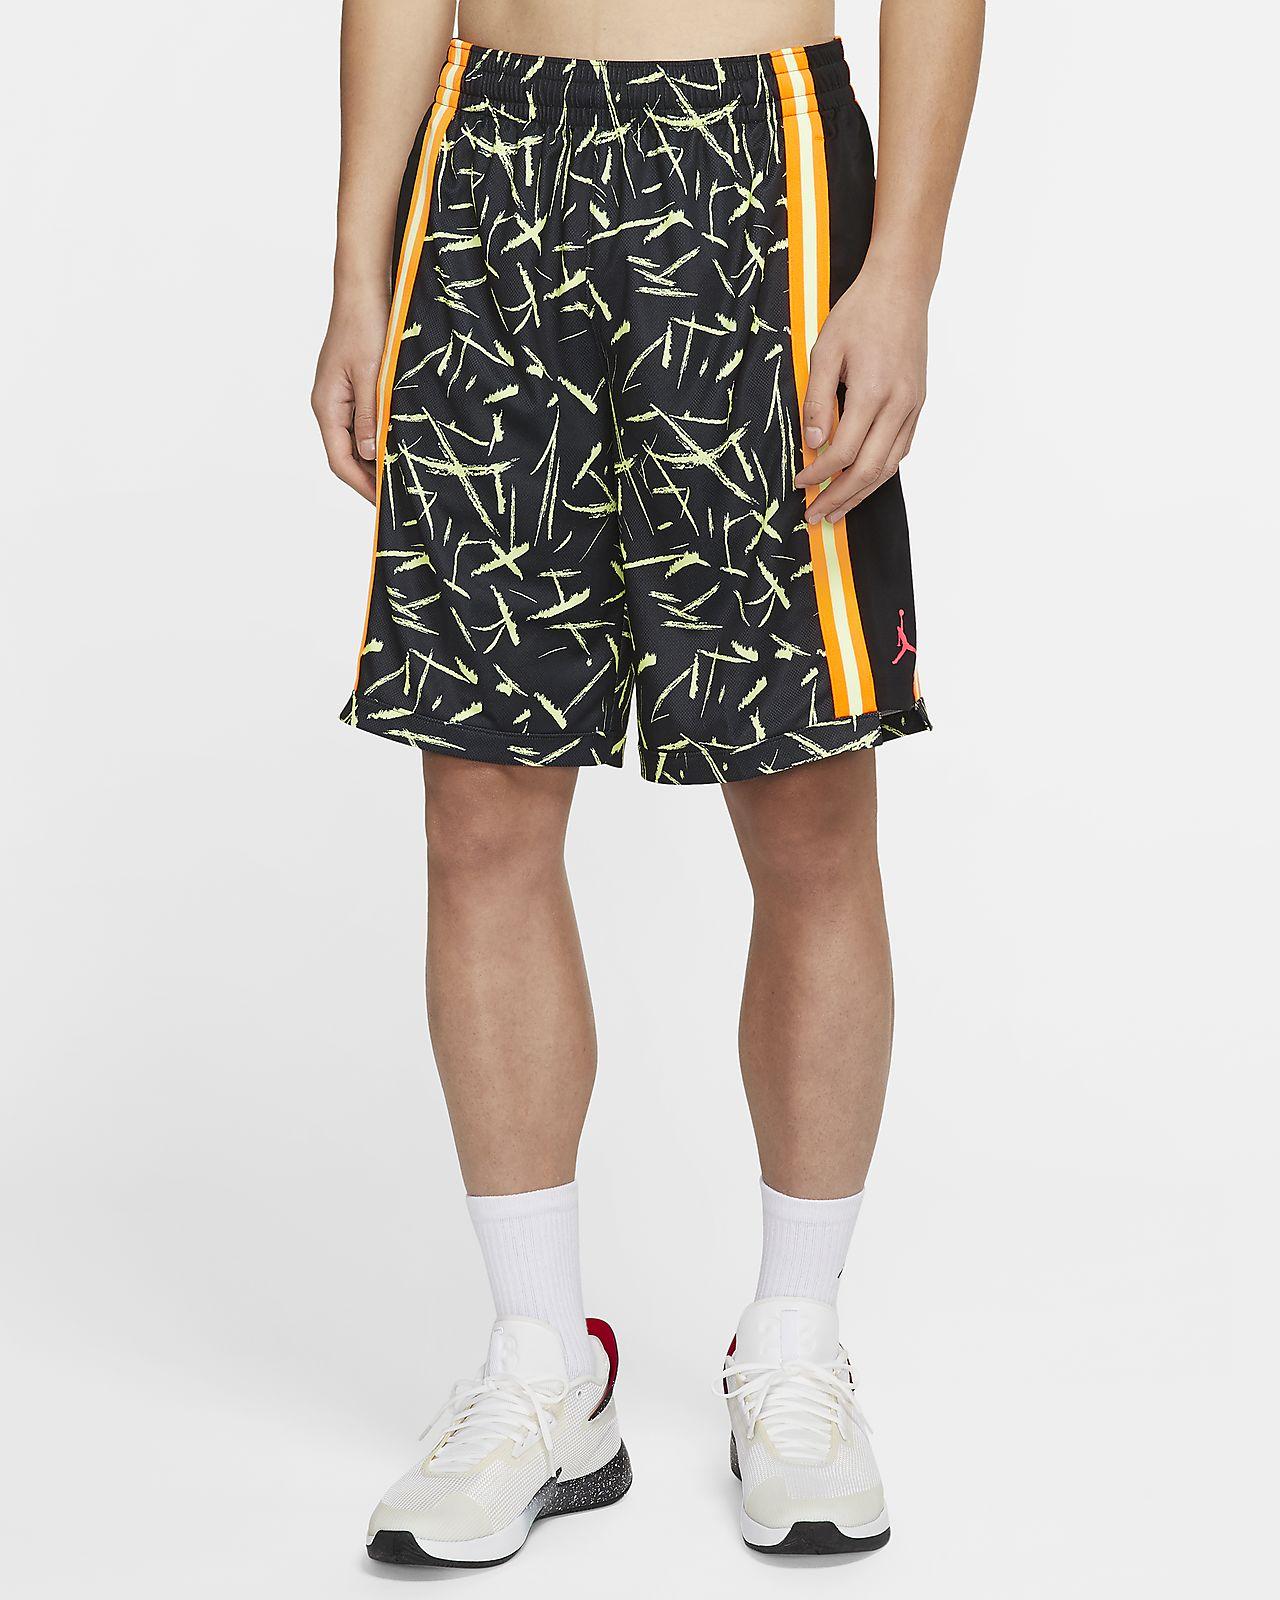 Jordan Dongdan 男子篮球短裤